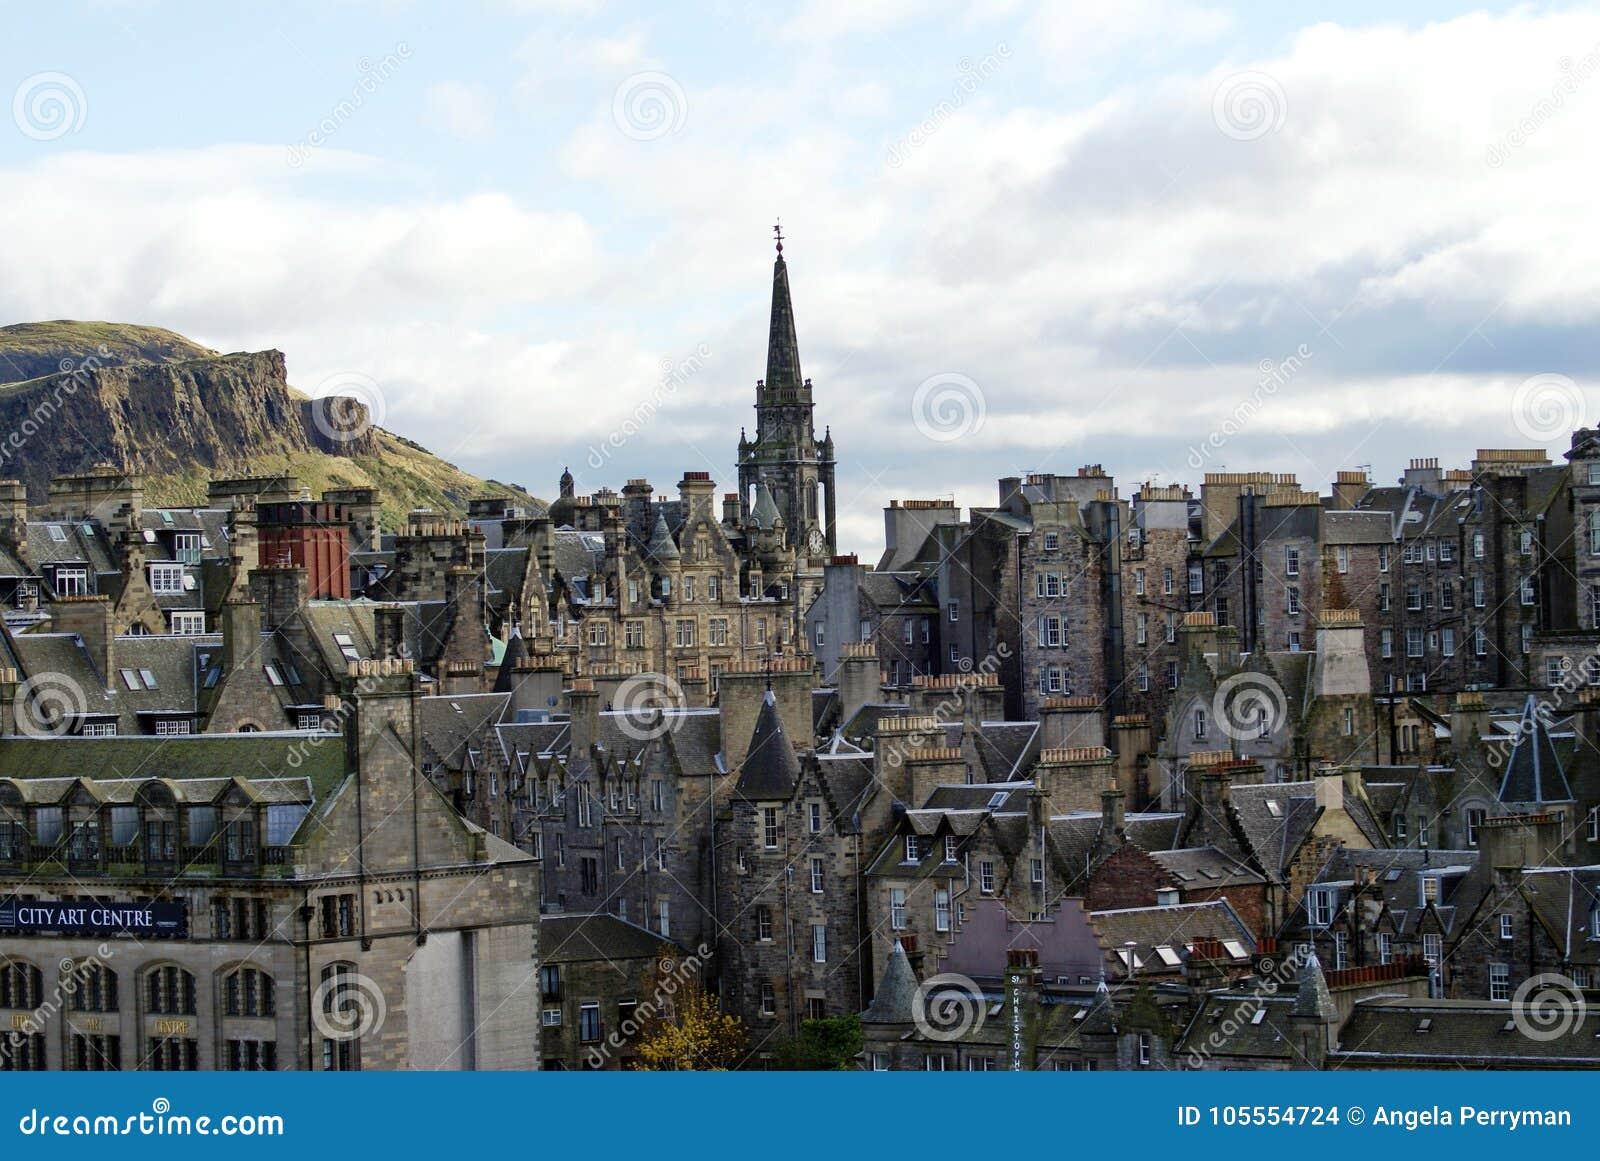 Tron Kirk Spire in Oude Stad in Edinburgh